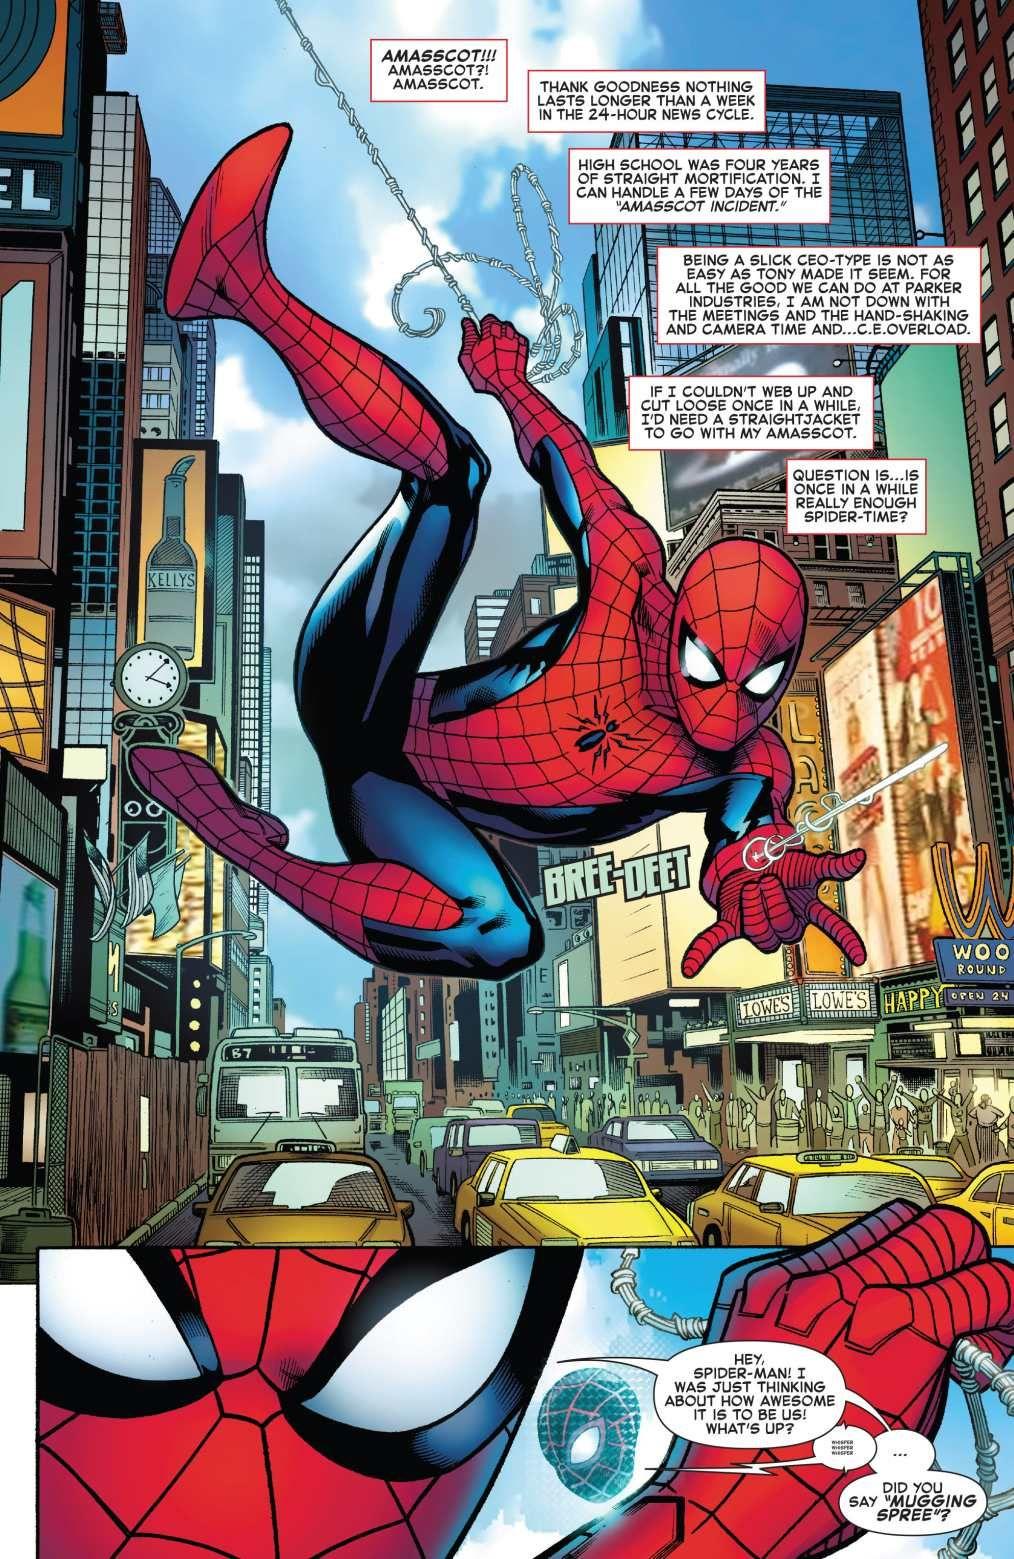 Artist Adailson Comic Read Comics Online Free Spider Man Deadpool Chapter 002 Page 7 Spiderman Spiderman Comic Amazing Spiderman